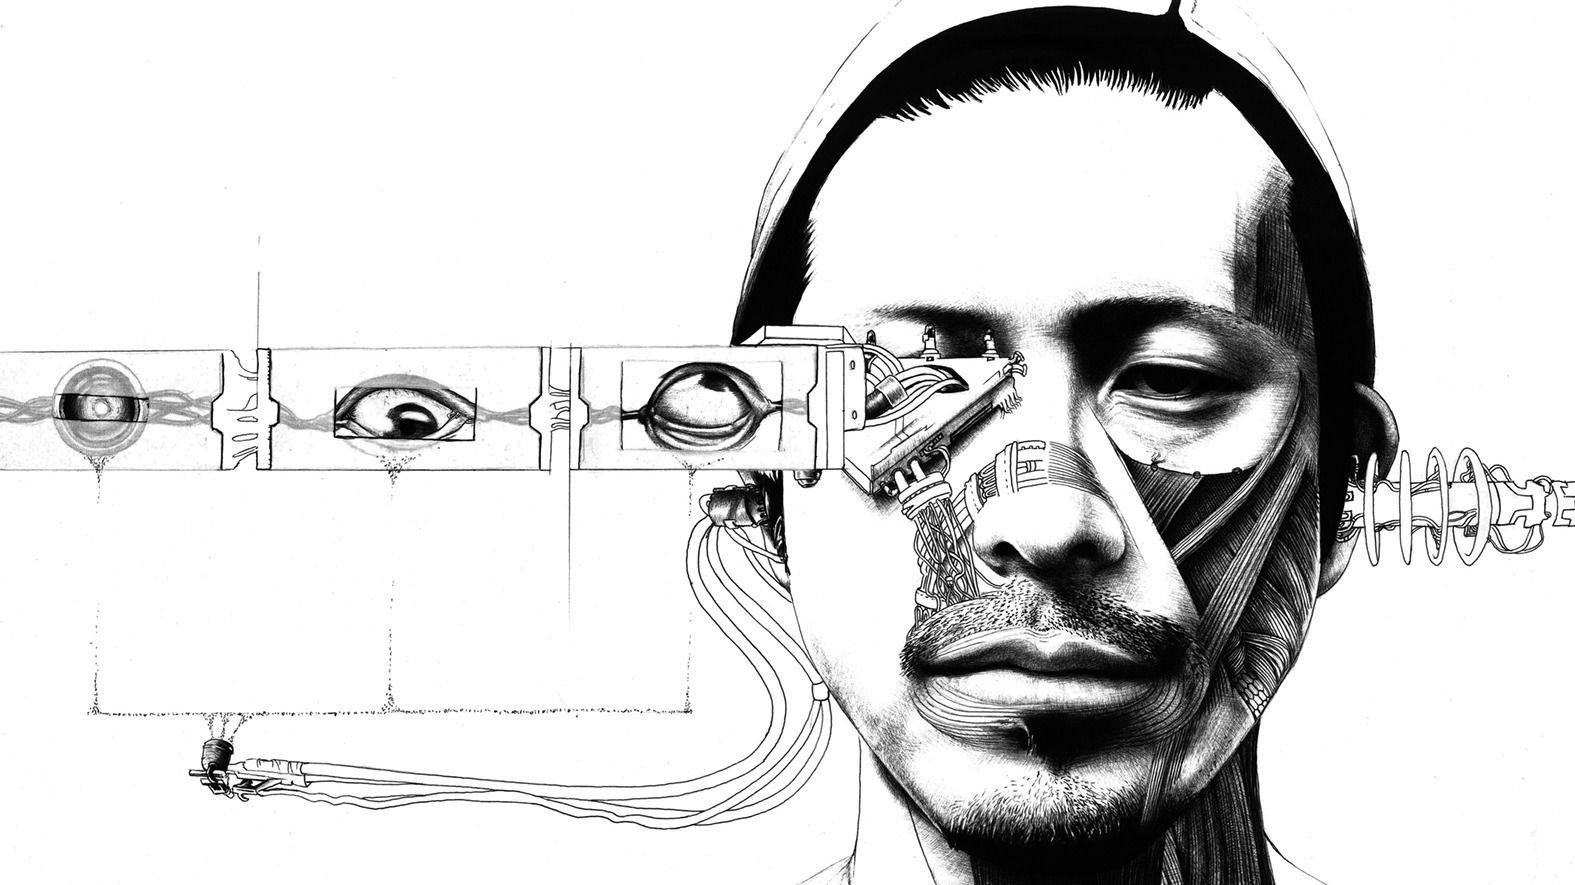 Pax Solaria - Cryonics, Digital Immortality, Mind Uploading